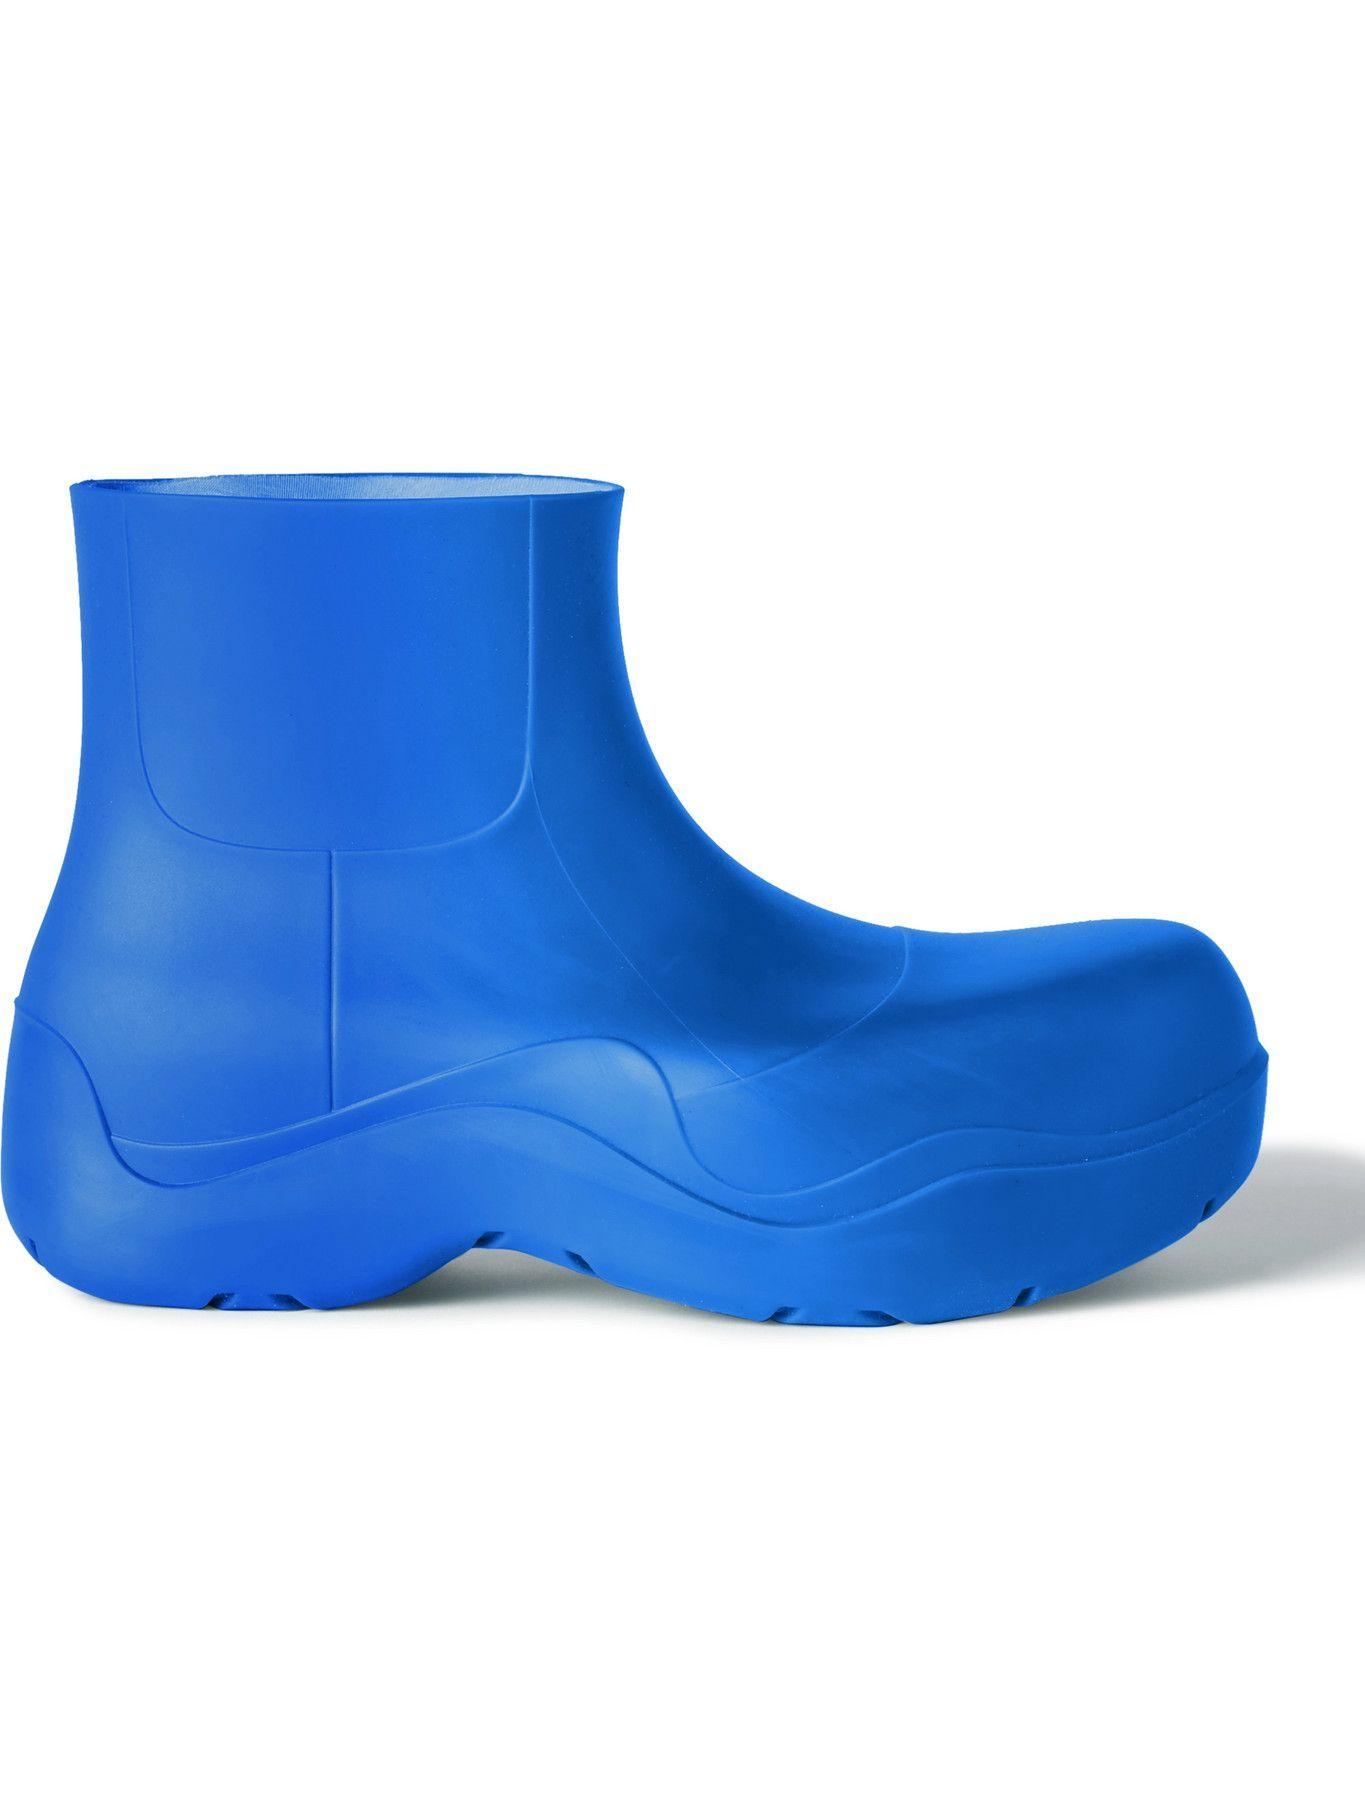 Bottega Veneta - Puddle Rubber Boots - Blue